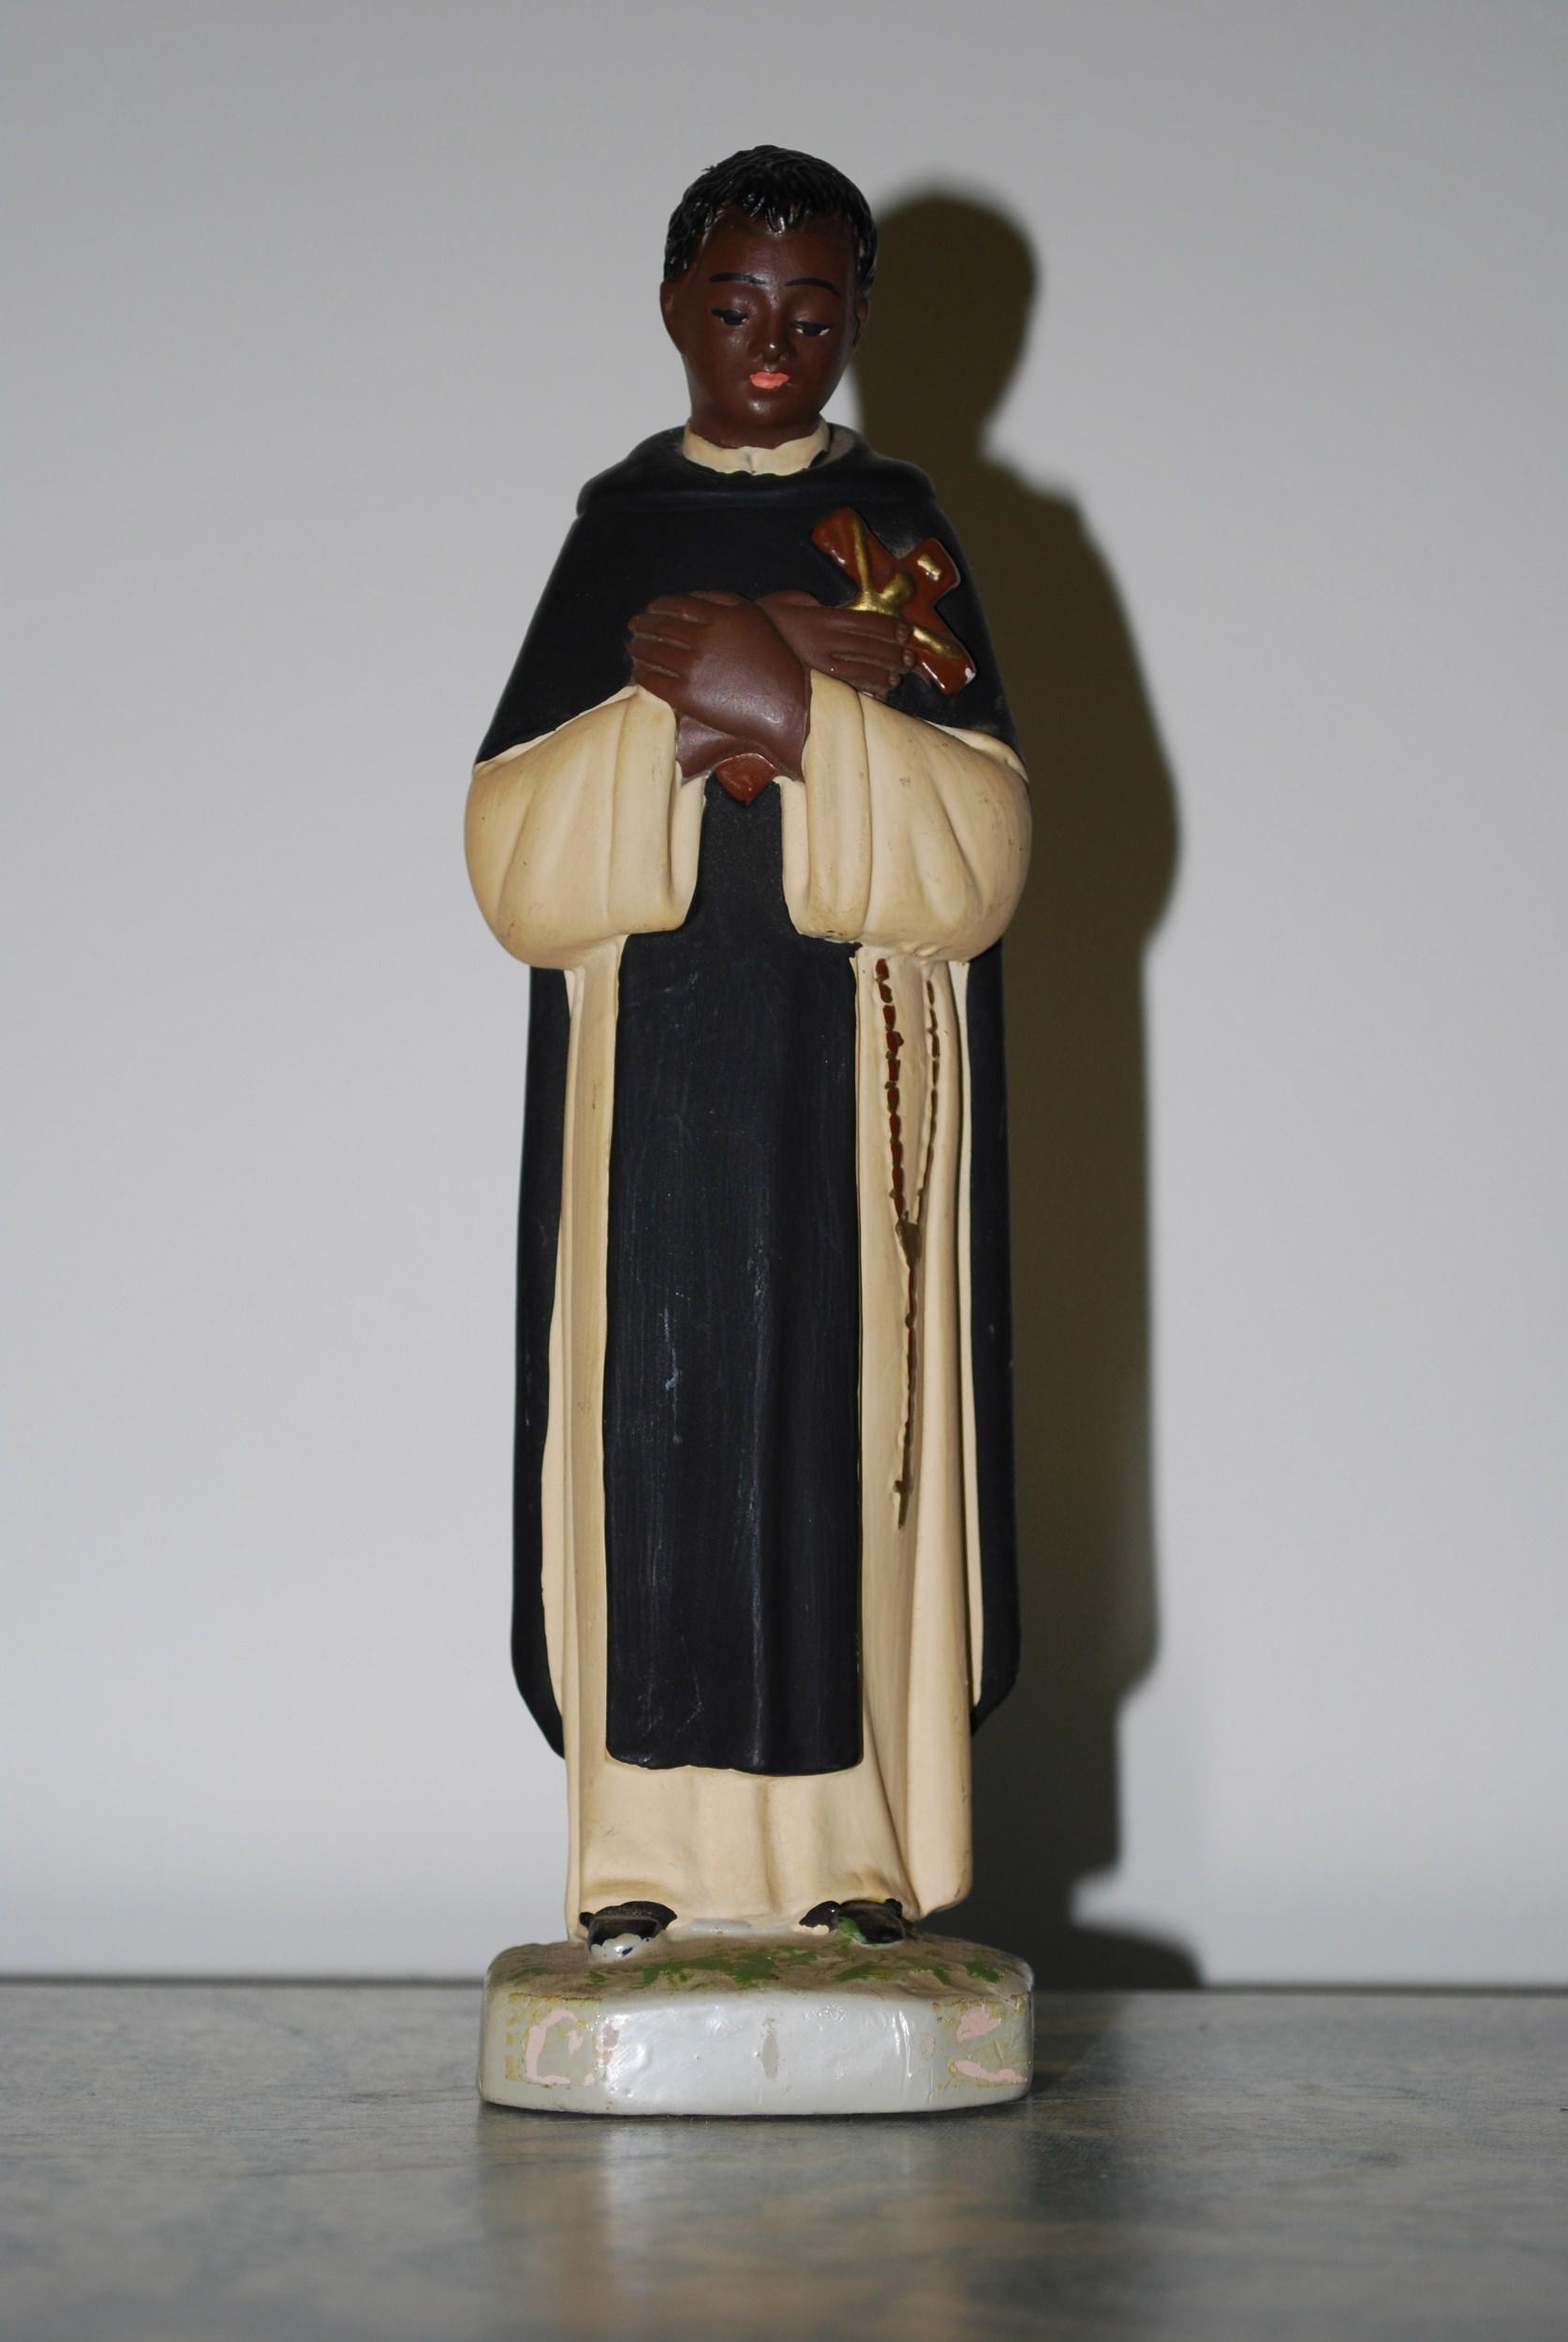 Fig.4 St. Martin of Porres, ca. 1950-1970